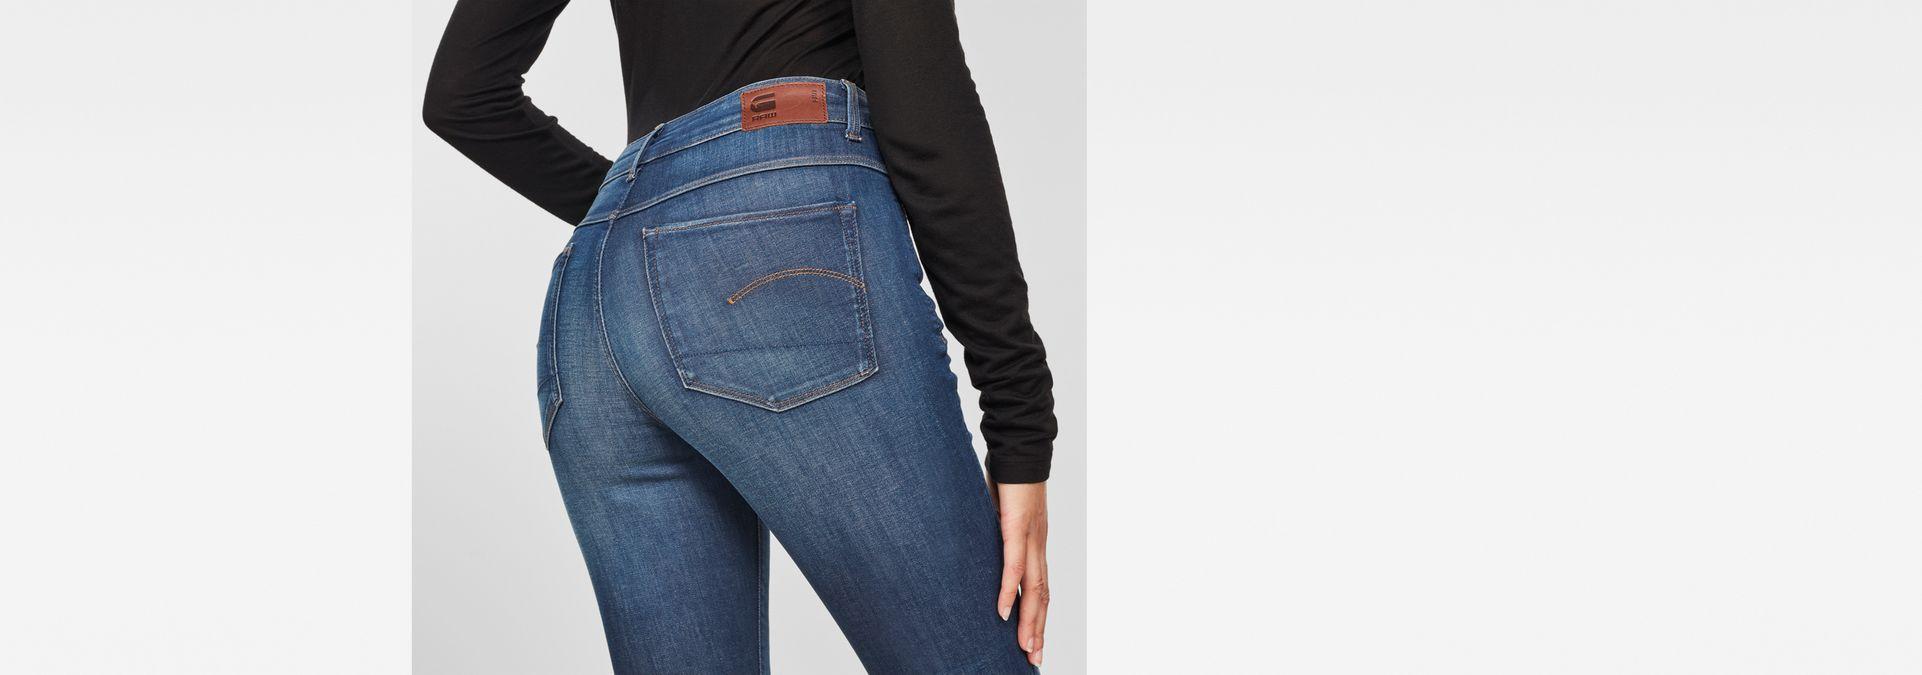 G-STAR RAW 3301 Deconstructed High Waist Skinny Jeans Femme